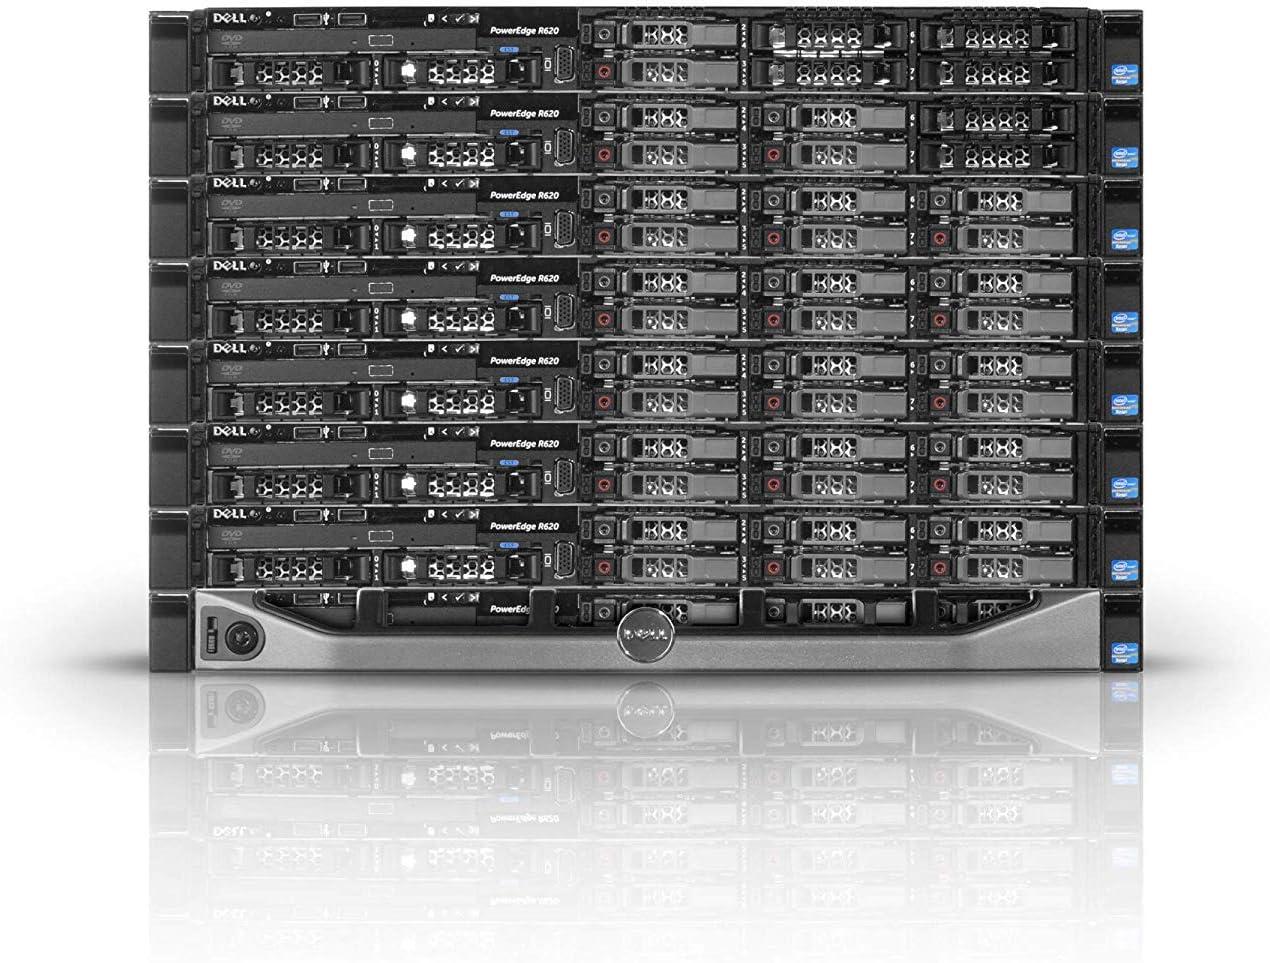 Dell POwerEdge R620 Server 2X E5-2650 16 Cores 96GB H710p 8X 600GB SAS Drives (Renewed)